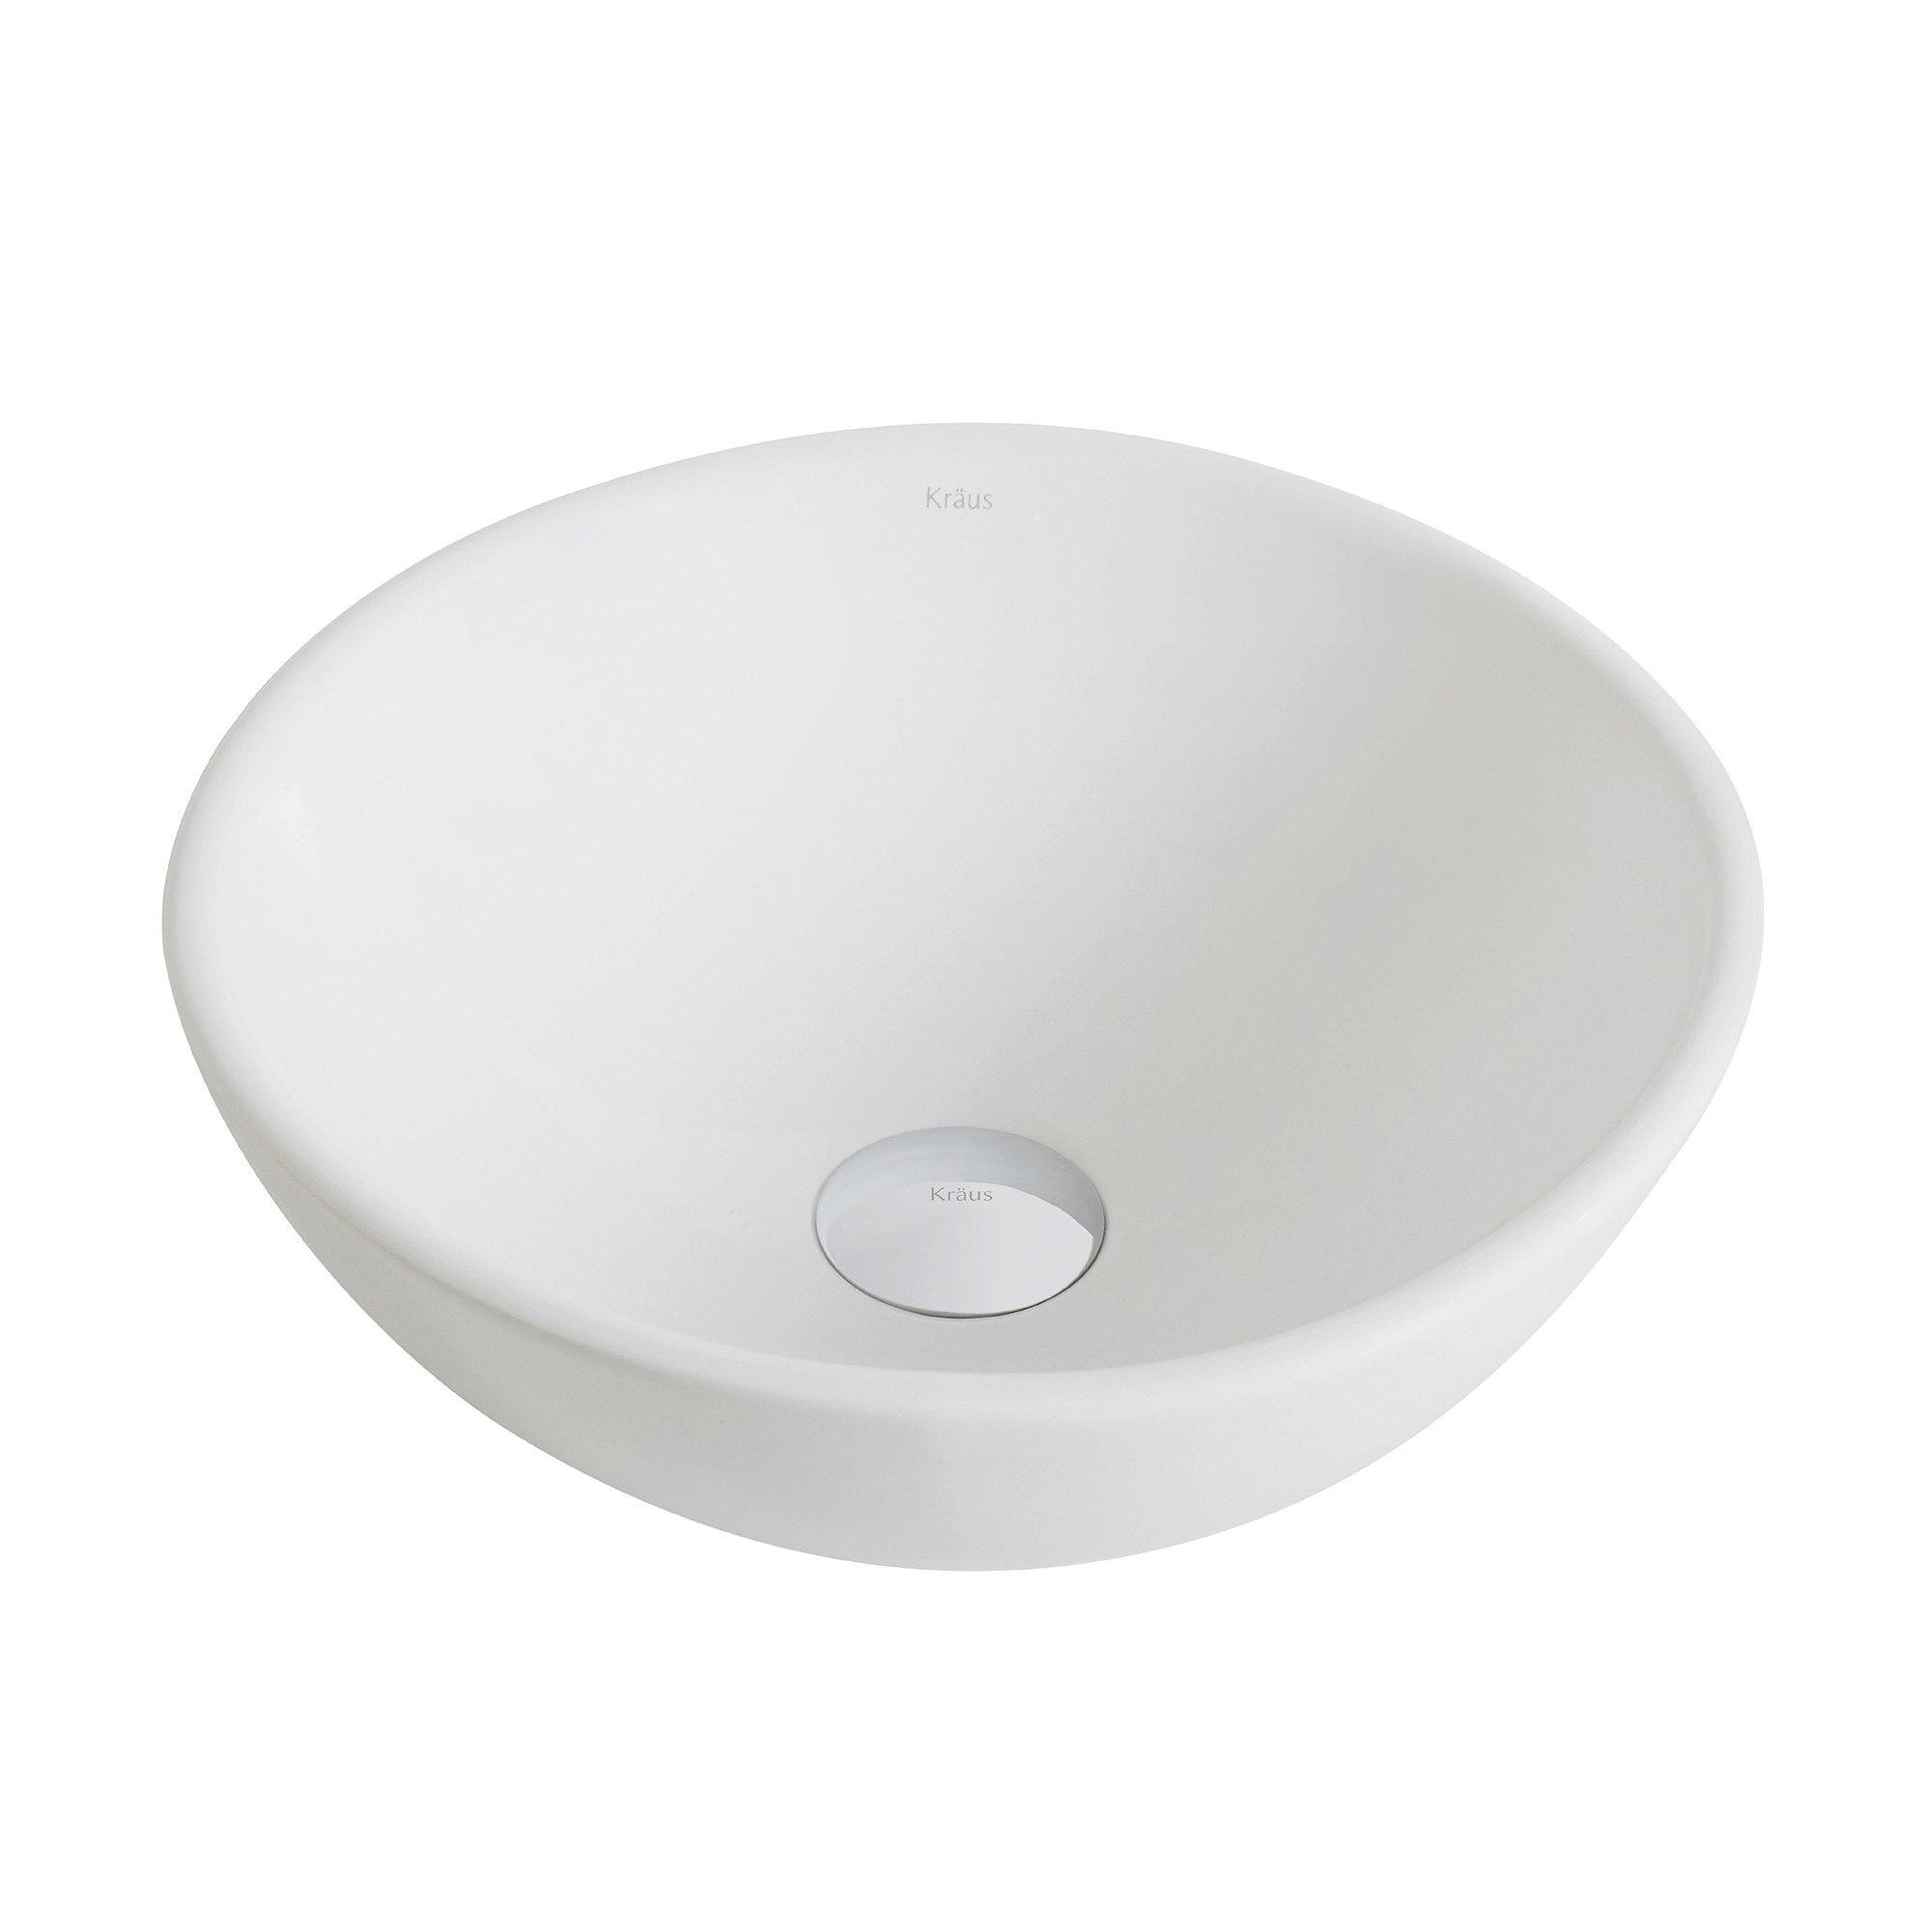 Kraus Kcv341 Elavo White Ceramic Small Round Vessel